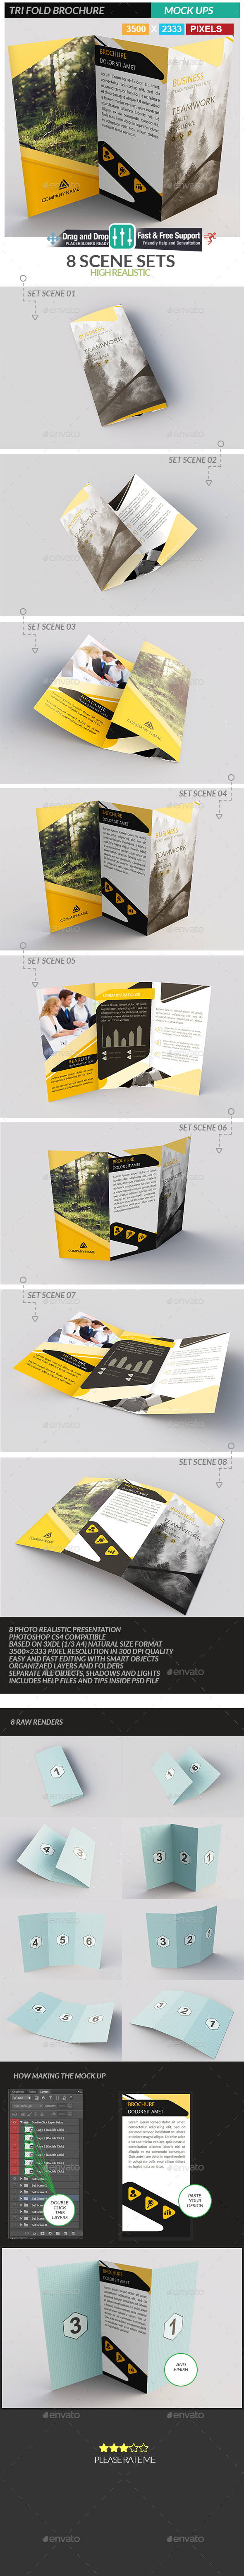 Tri Fold Brochure MockUps - Realistic Brochure MockUps - Brochures Print